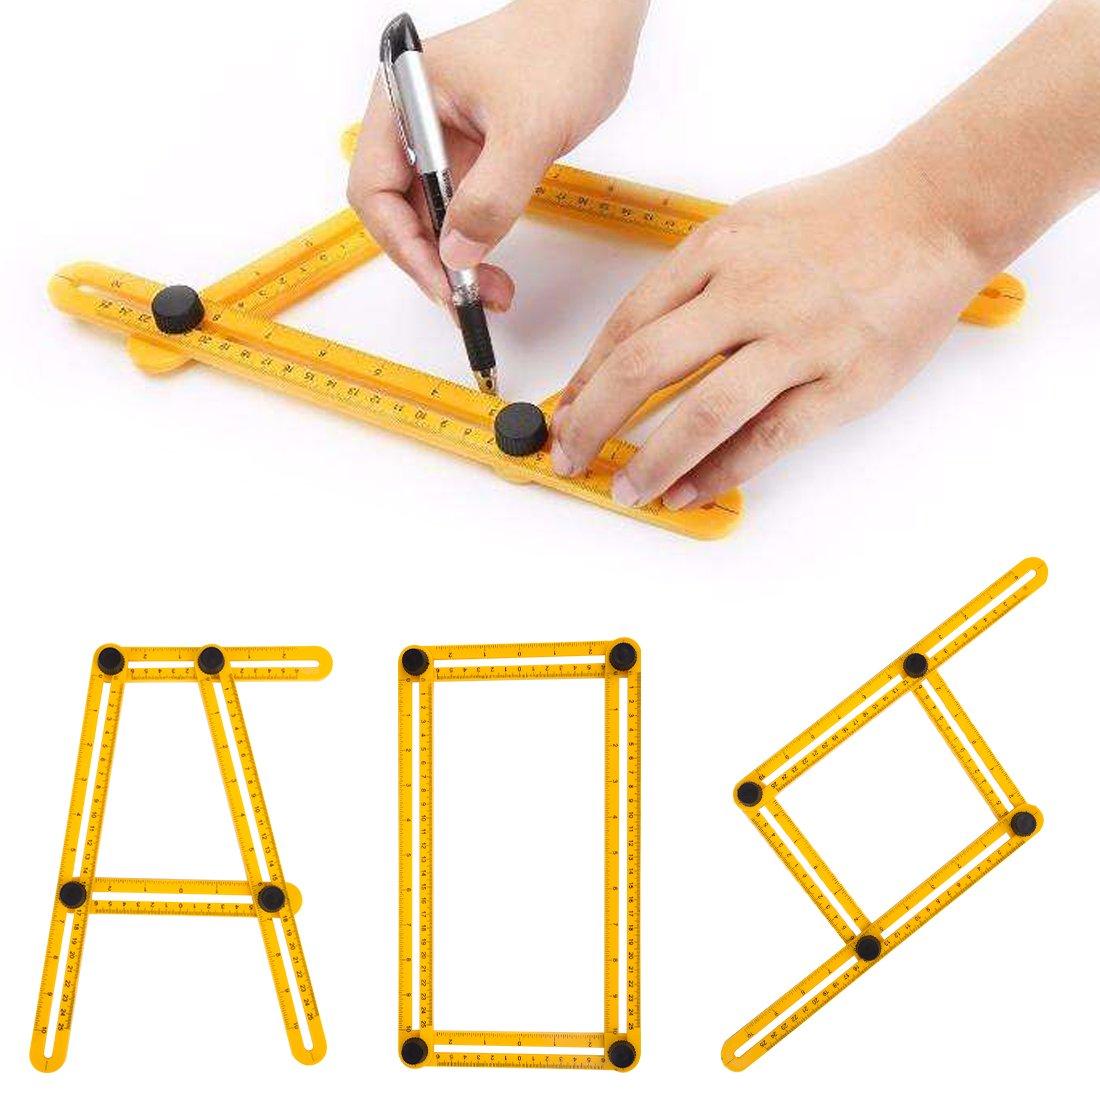 Handsaws Set, Four Fold Ruler, Multifunction Bow Saw +Angle Measuring Ruler for Engineer Handymen Builders Craftsmen by SILIVN by SILIVN (Image #5)